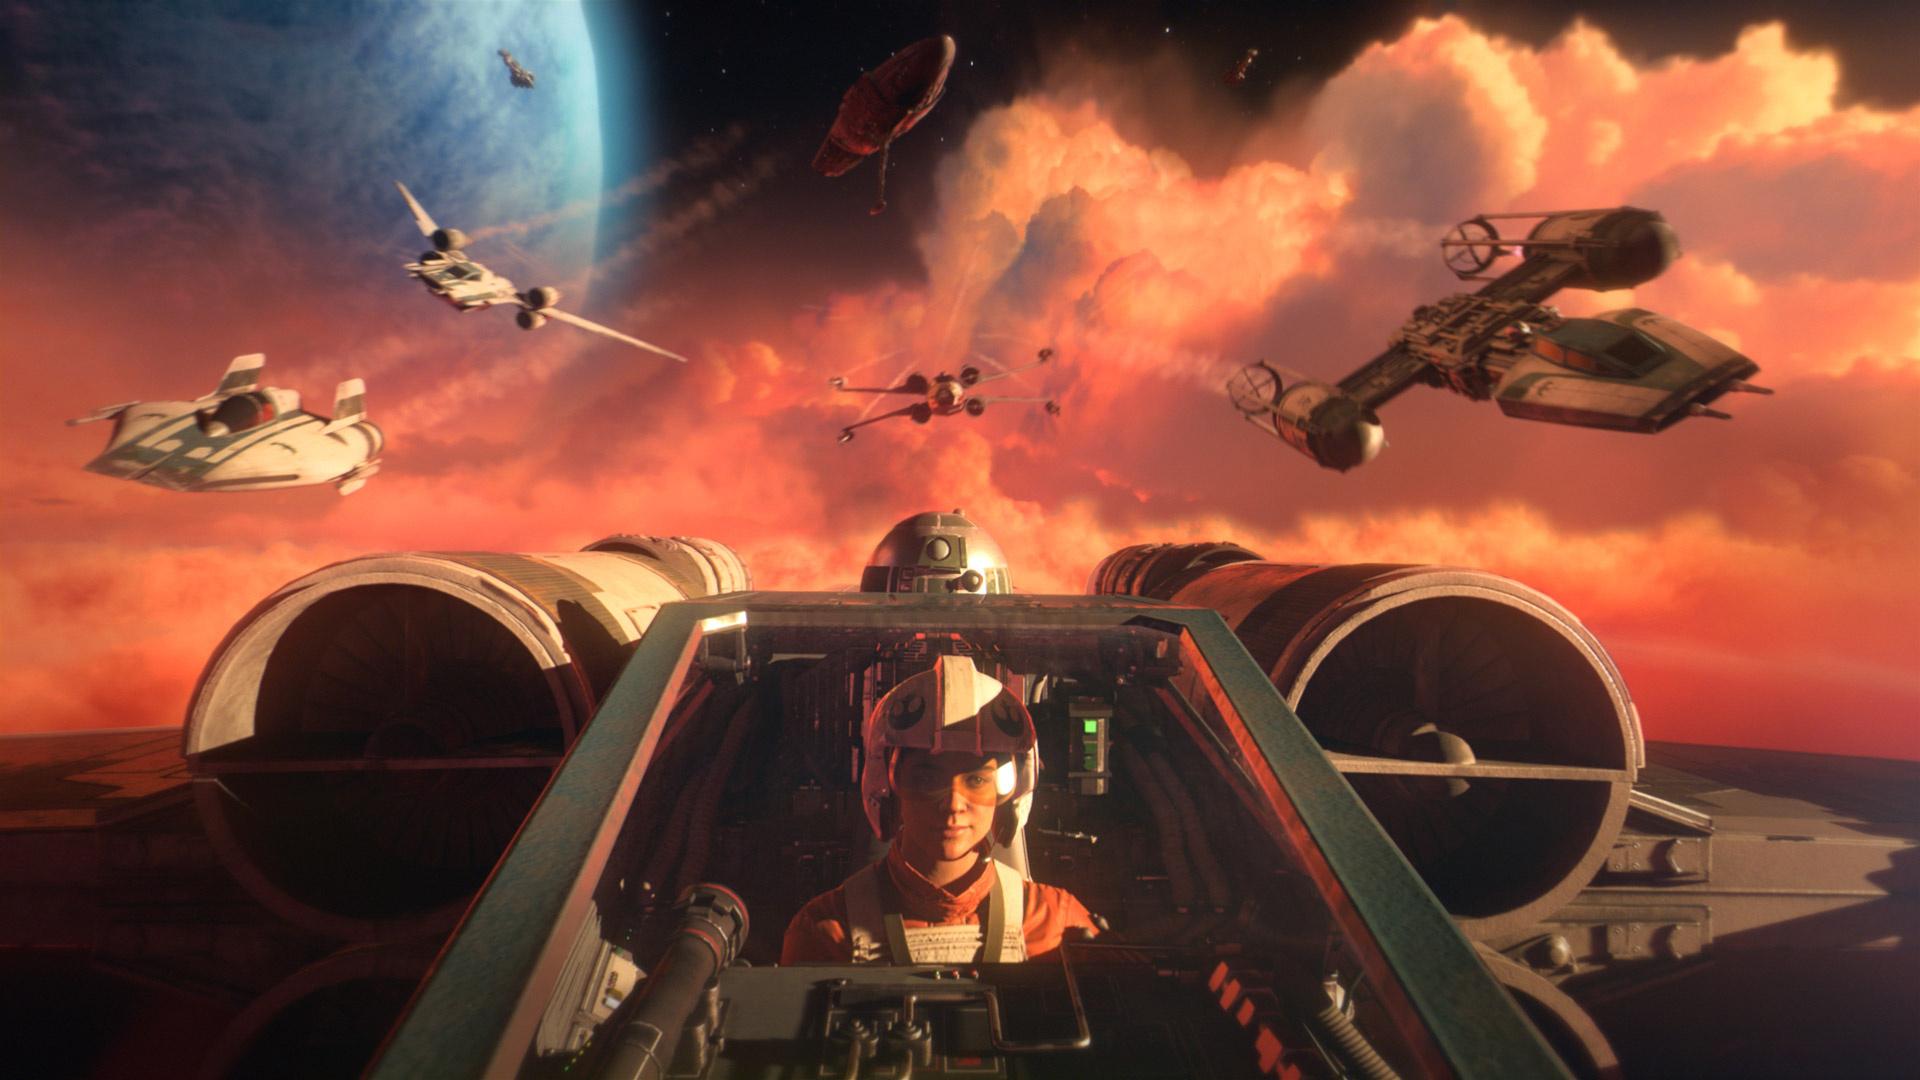 NBA 2K21, Football Manager 2021, SW: Squadrons и другие выйдут в Xbox Game Pass